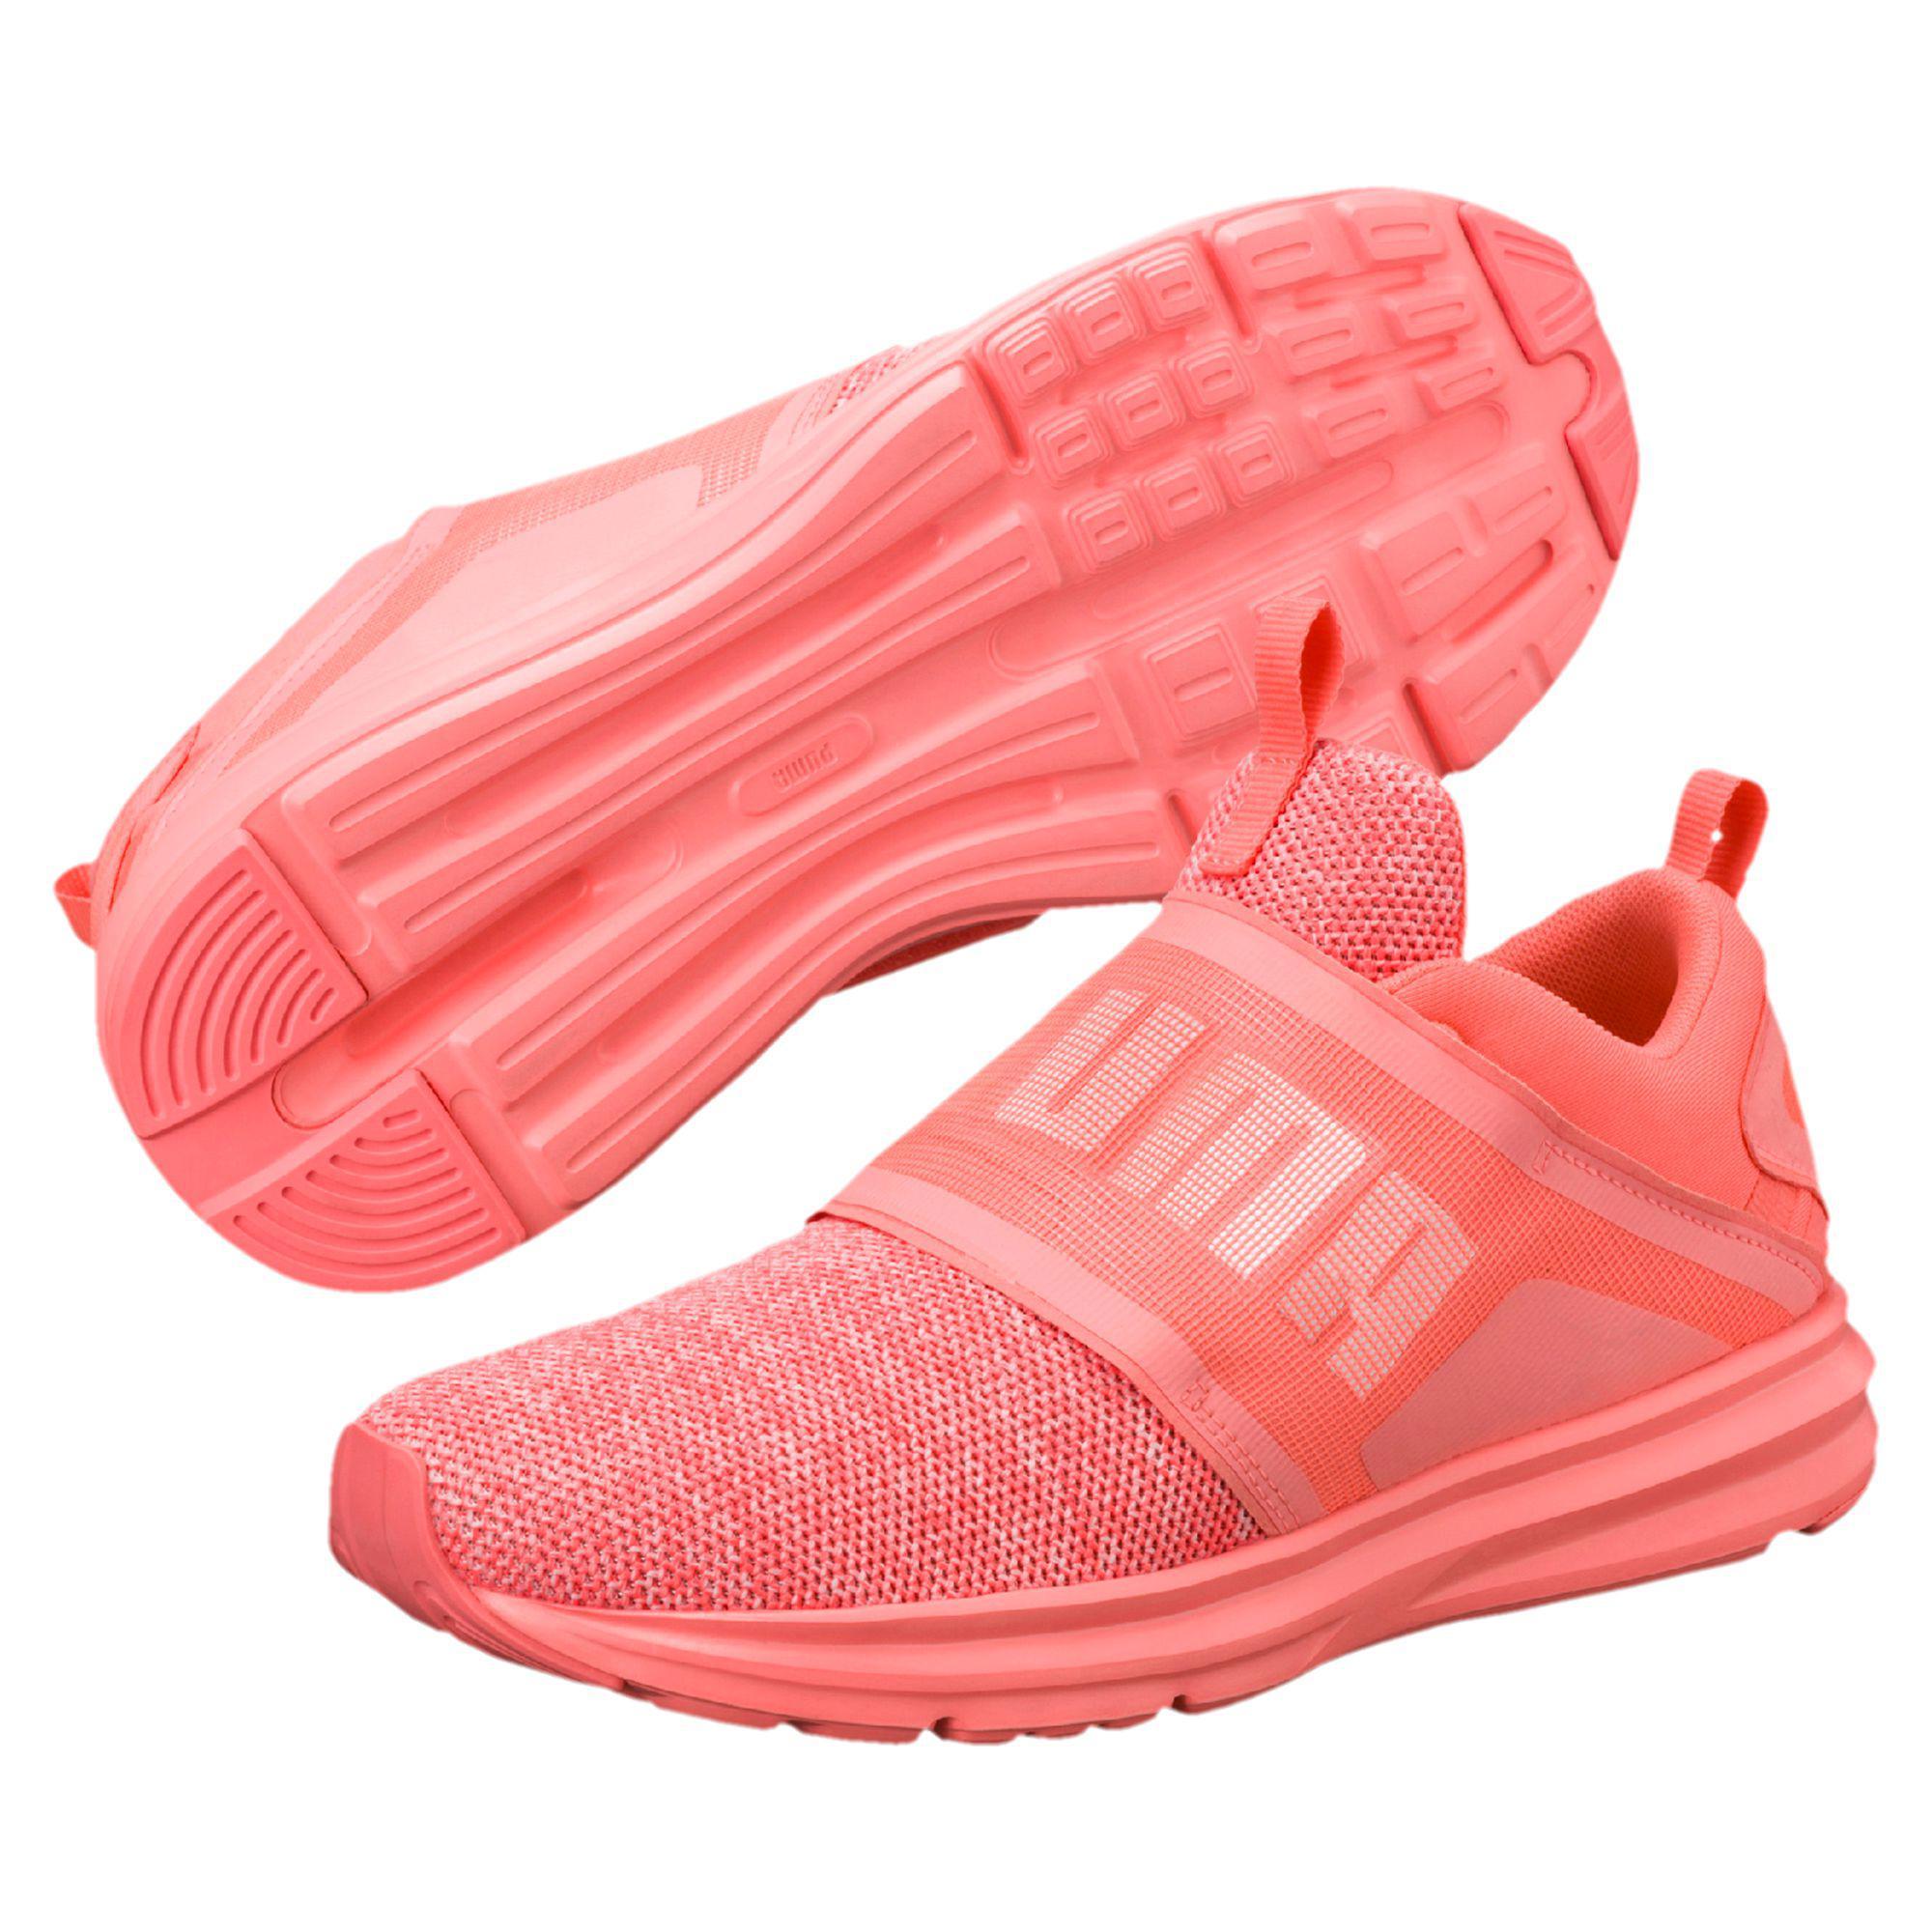 64aa965dda8e14 Lyst - PUMA Enzo Strap Knit Women s Running Shoes in Pink